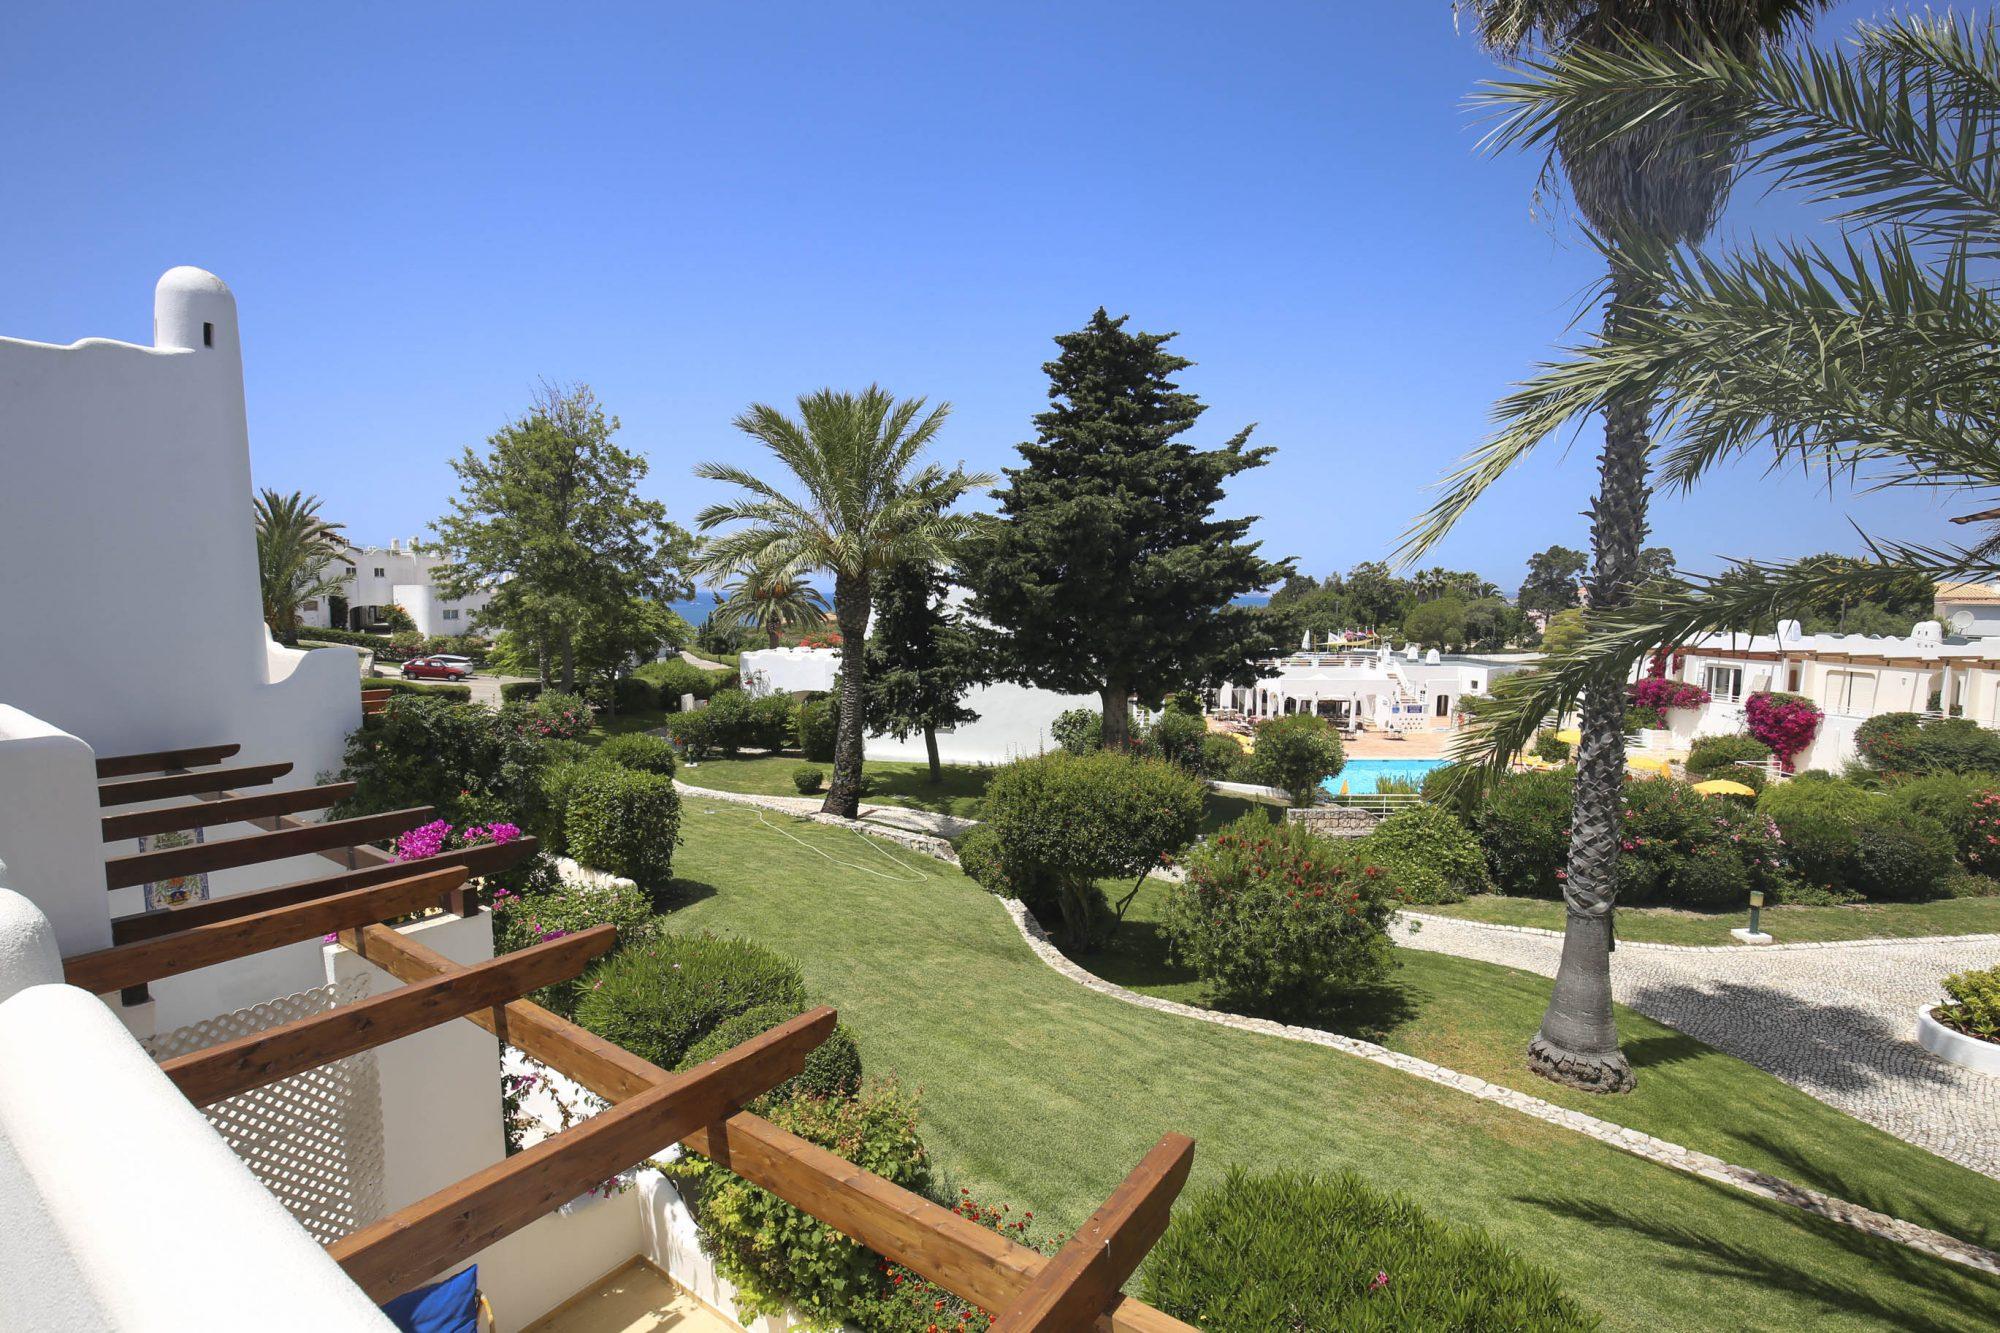 Villa Gaivotta T2 western Algarve-views- Enneking Premium Rentals